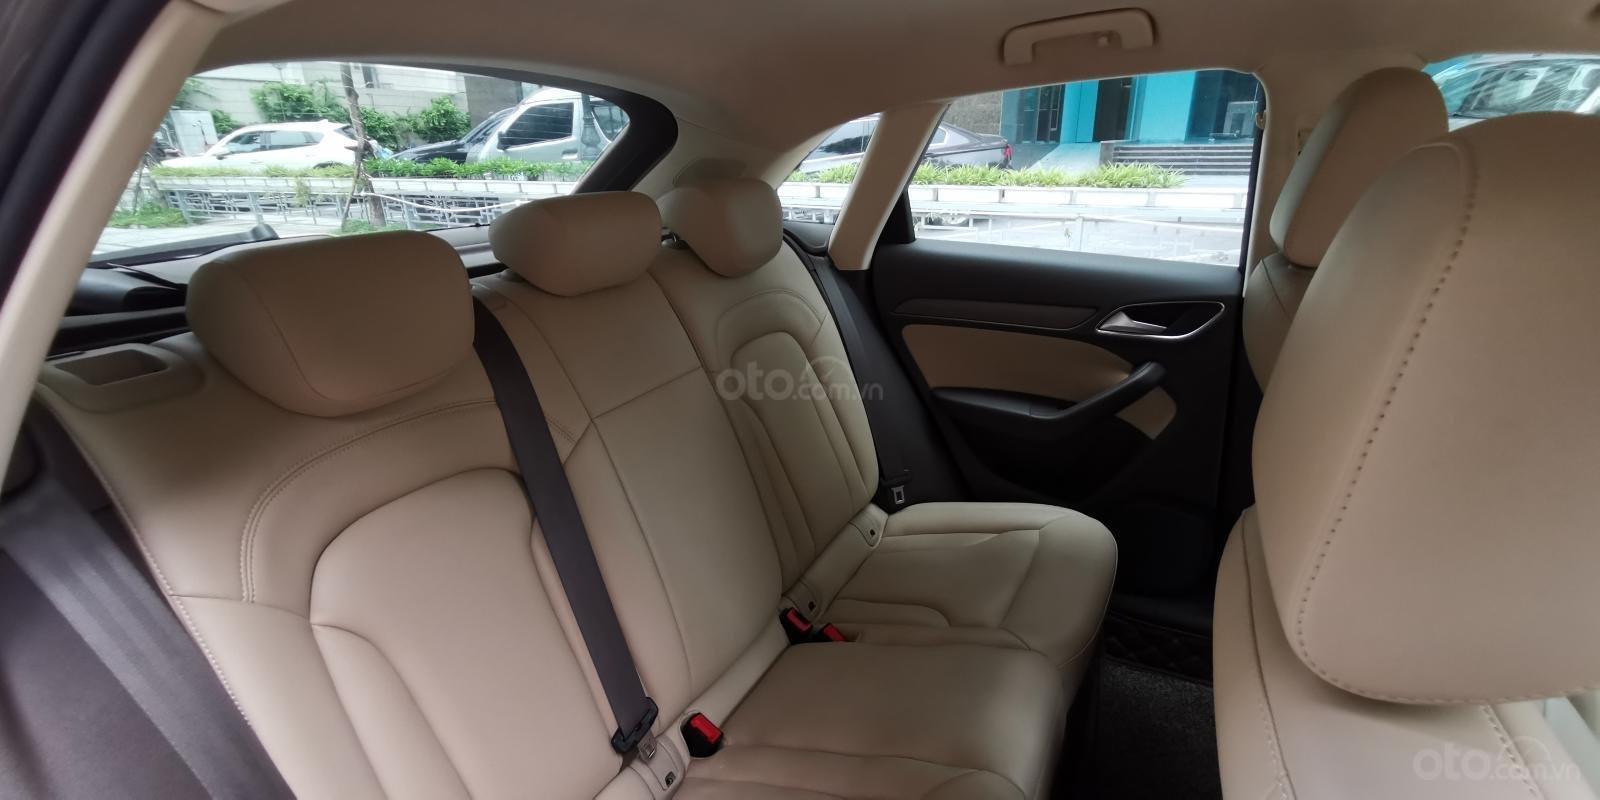 Audi Q3 2.0 Quattro nhập khẩu 2015 (13)